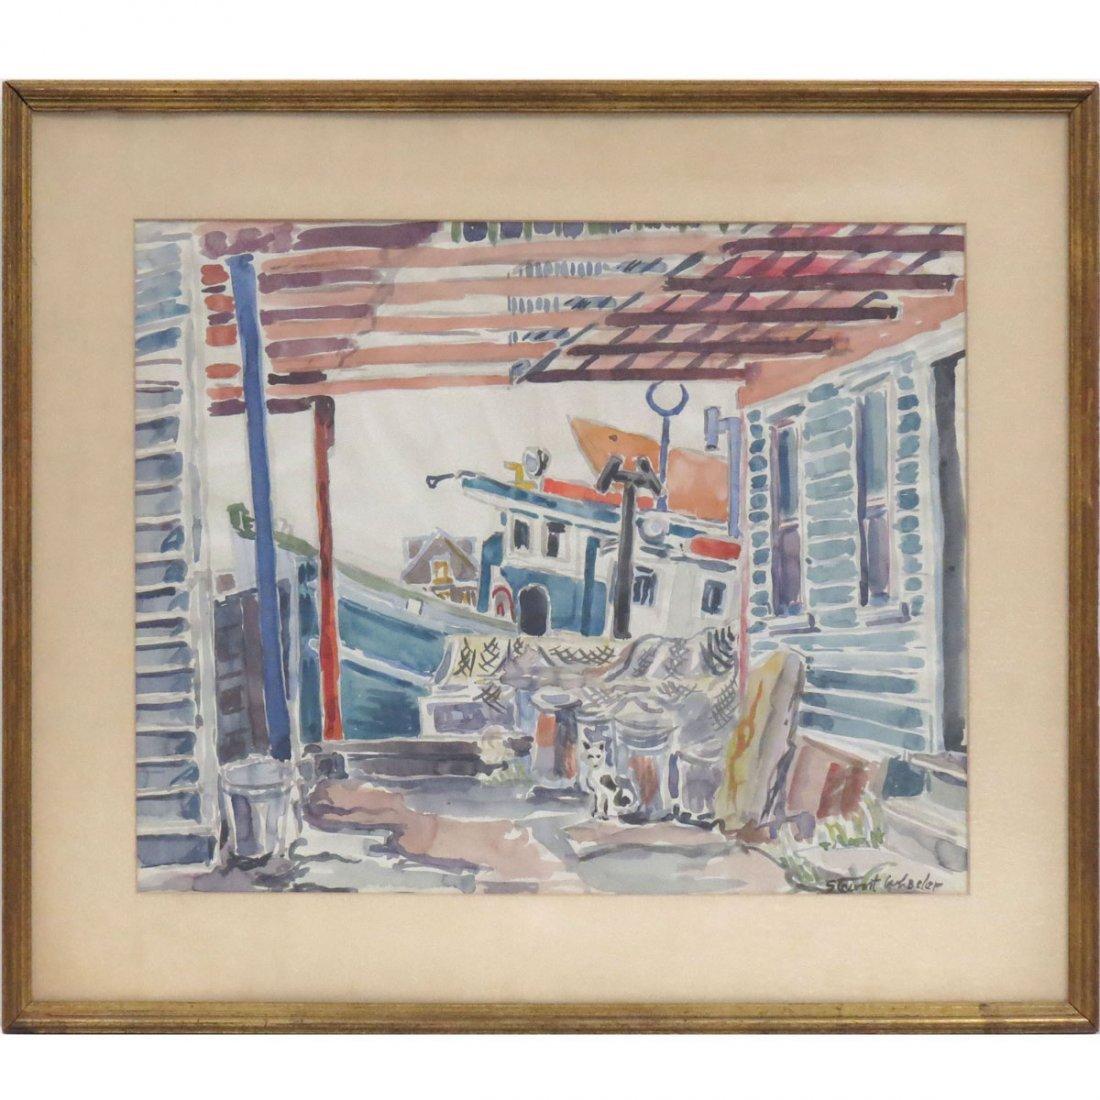 STEWART WHEELER (AMERICAN 1906-1975), WATERCOLOR